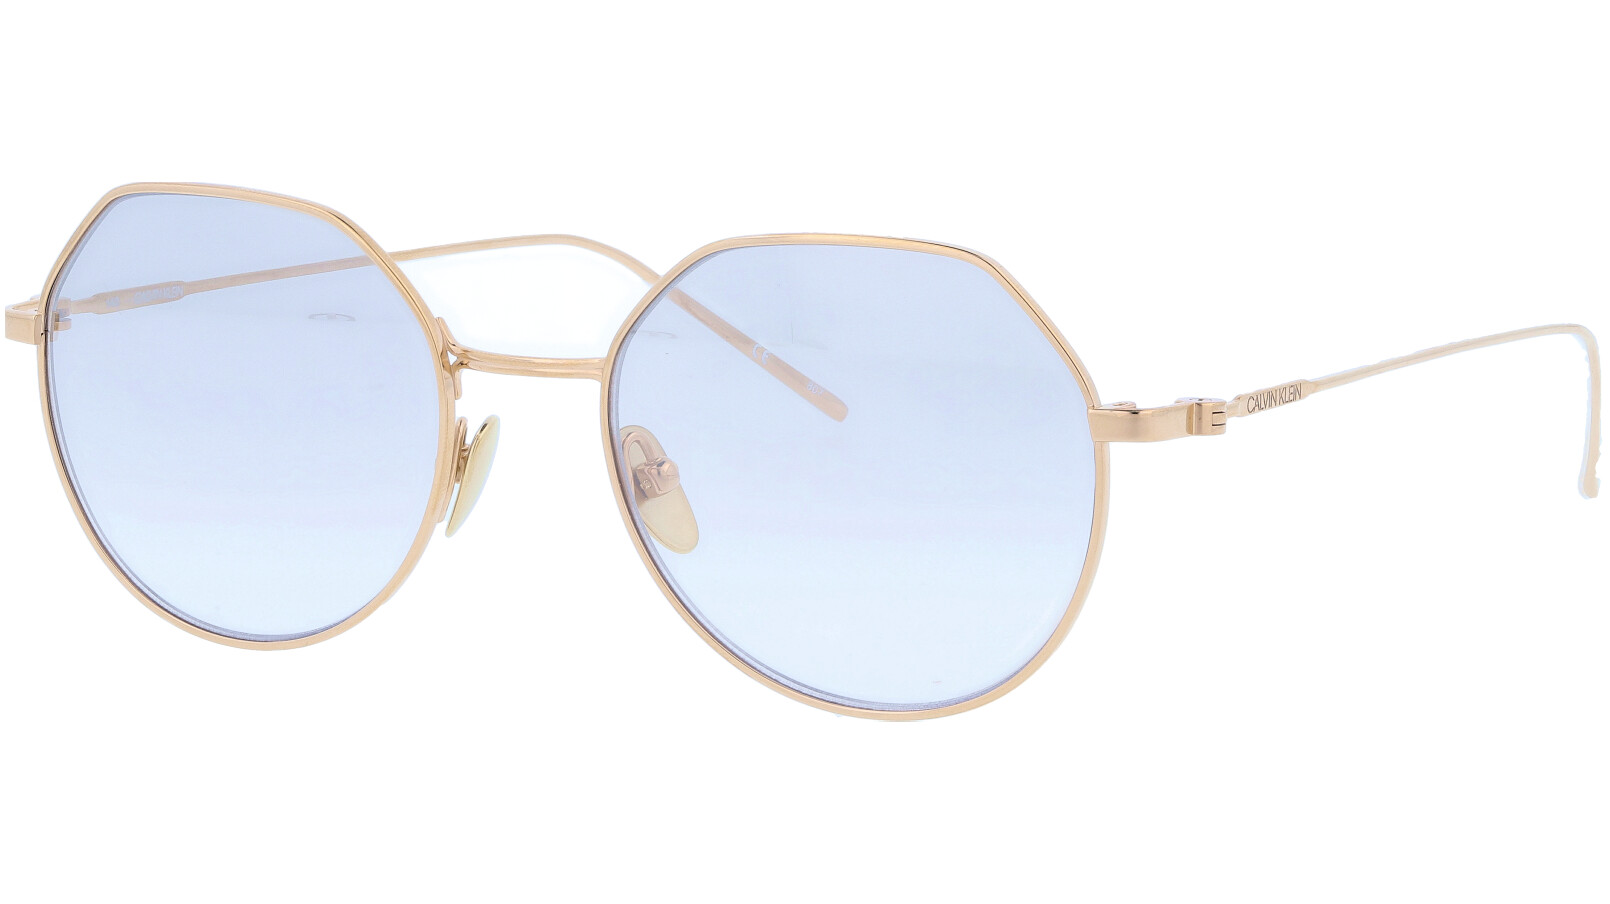 Calvin Klein CK18111S 008 51 Silver Sunglasses